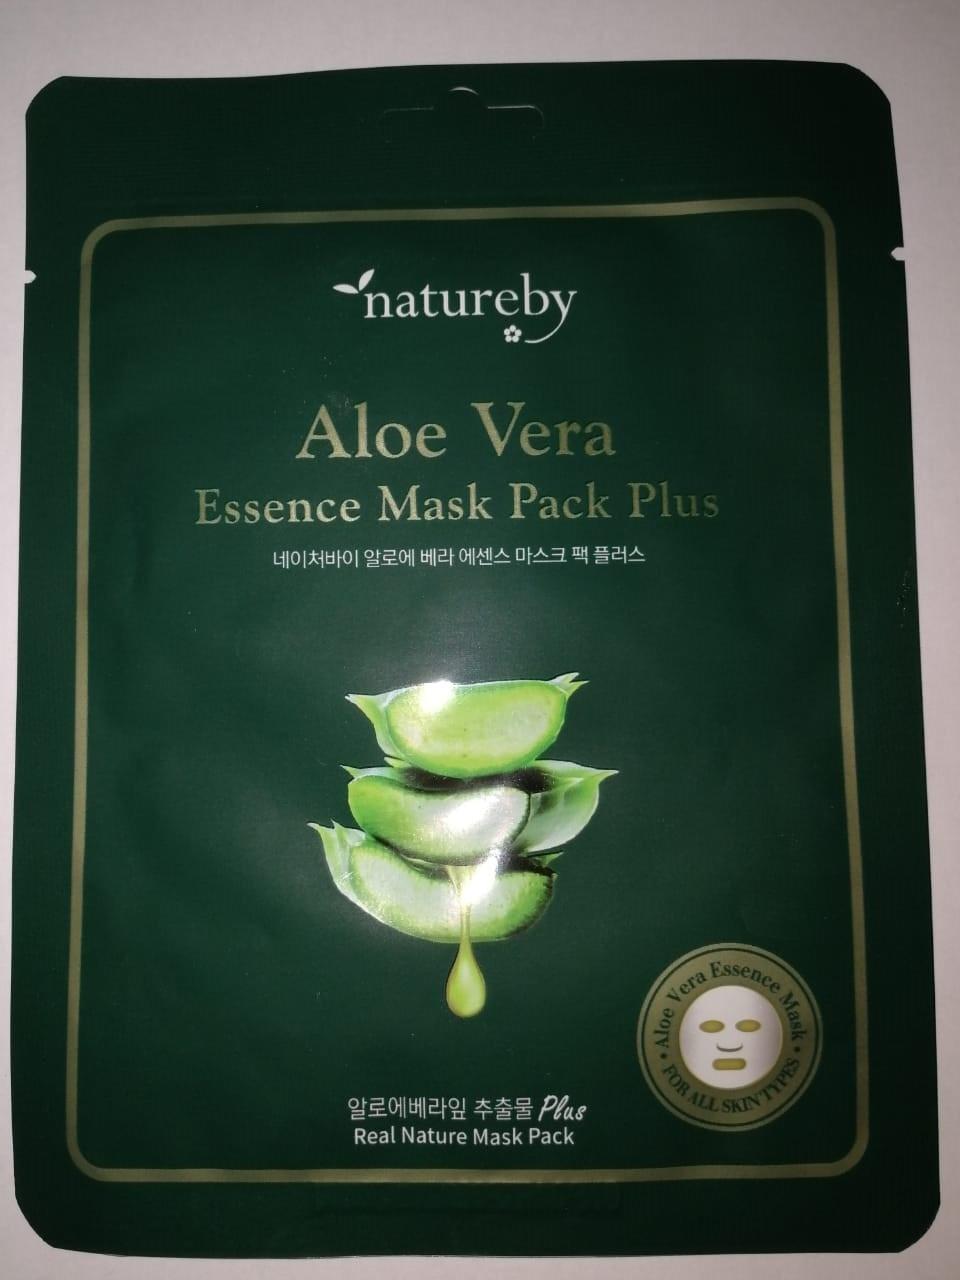 Natureby (Aloe) New Nourishing Mask With Aloe Extract 23gr Aloe & Pomegranate & Hyaluronic Acid Facial Mask Hydrating Nourishing Moisturizing Face Mask Depth Replenishment Oil-control